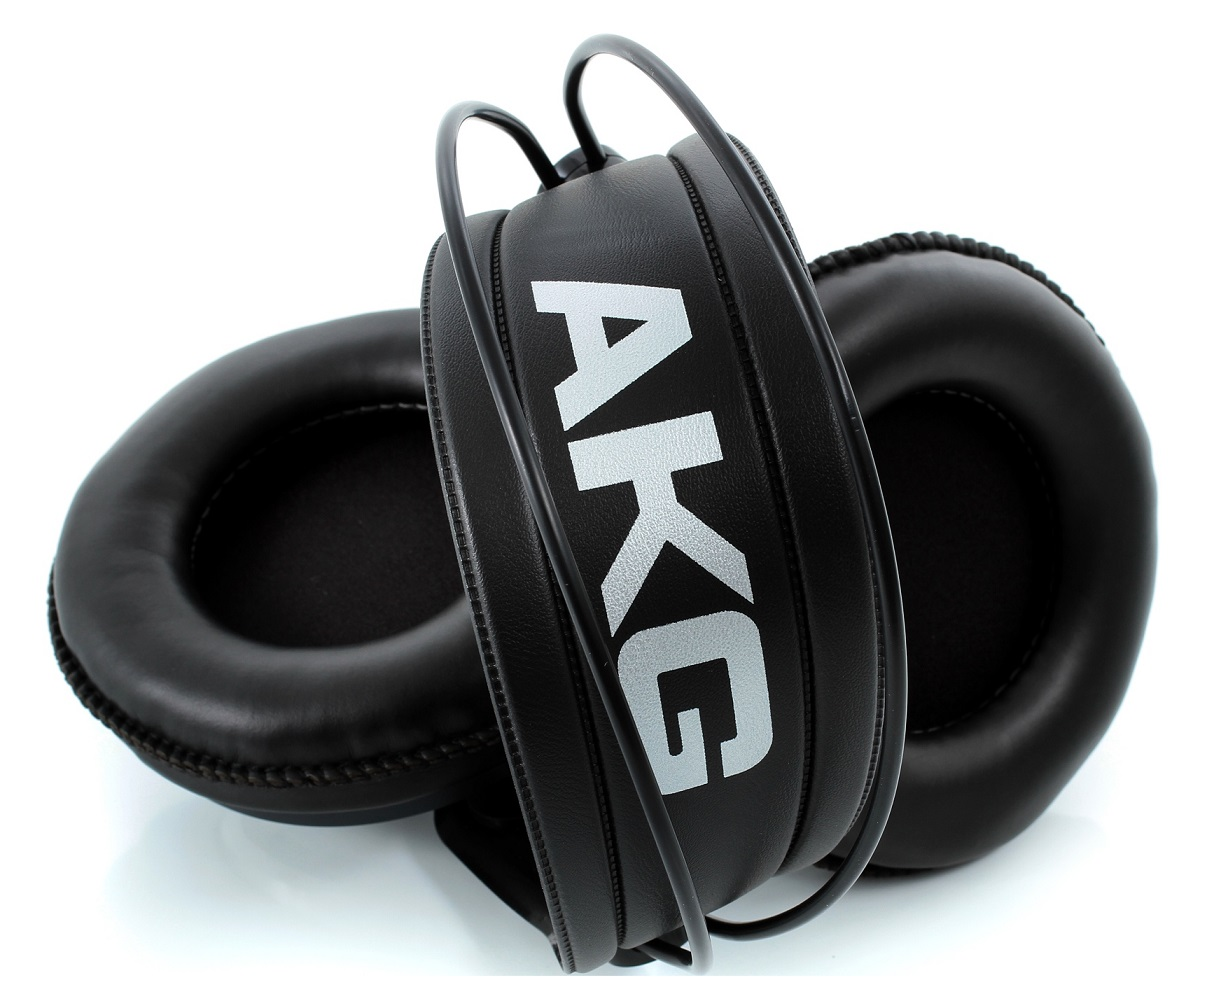 AKG : K240 MKII by MillionHead มิลเลี่ยนเฮด จำหน่ายอุปกรณ์ บันทึกเสียง  เครื่องเสียง ดีเจ ระบบแสง สี เสียง